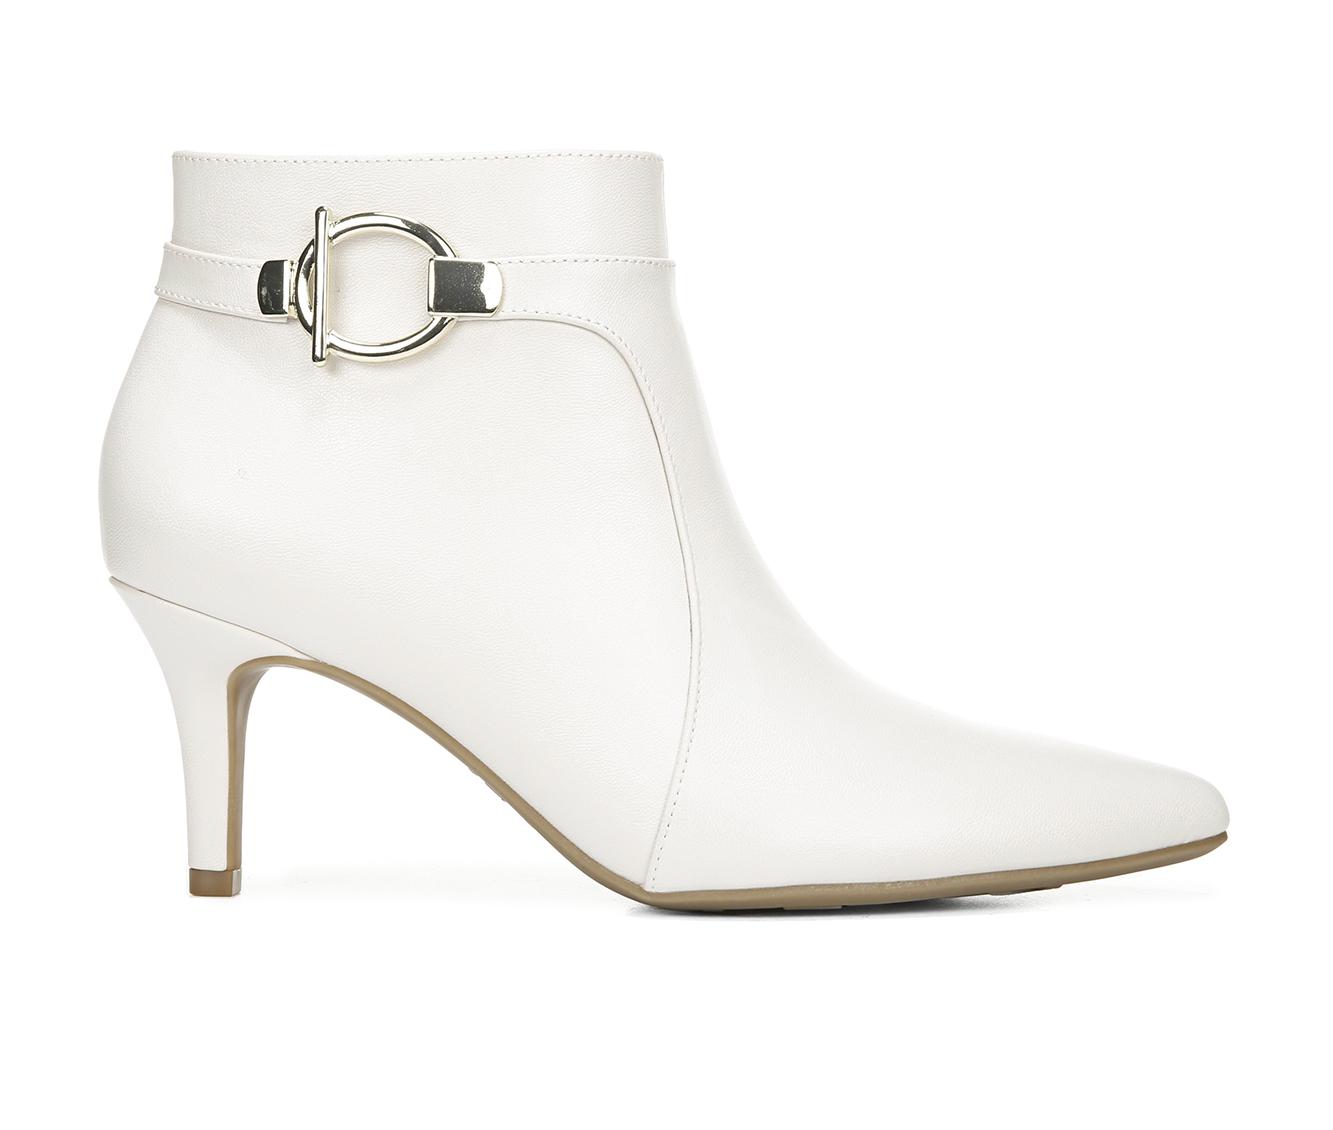 LifeStride Samara Women's Boots (White - Faux Leather)